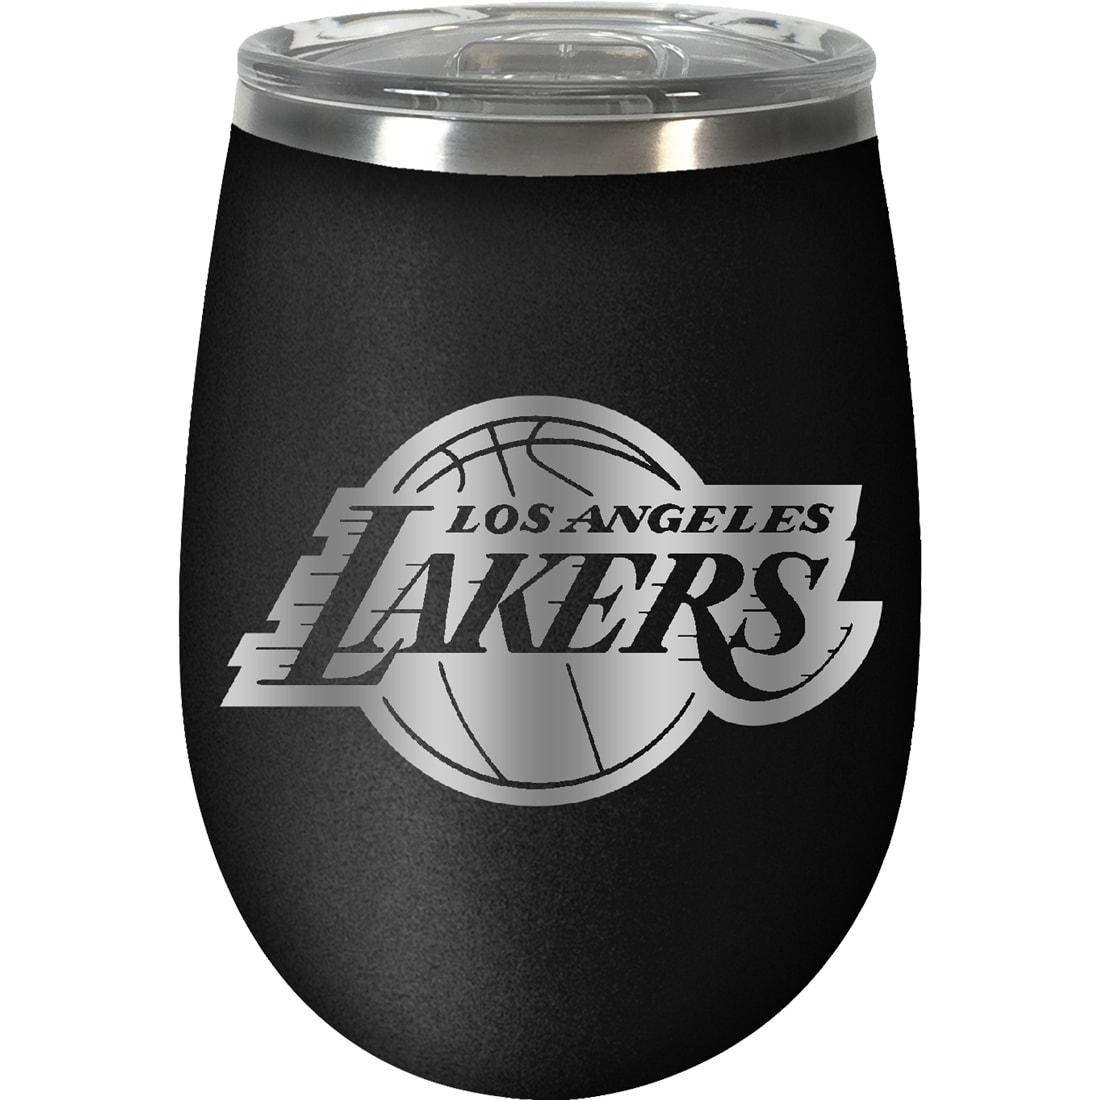 Los Angeles Lakers 12oz. Stealth Wine Tumbler